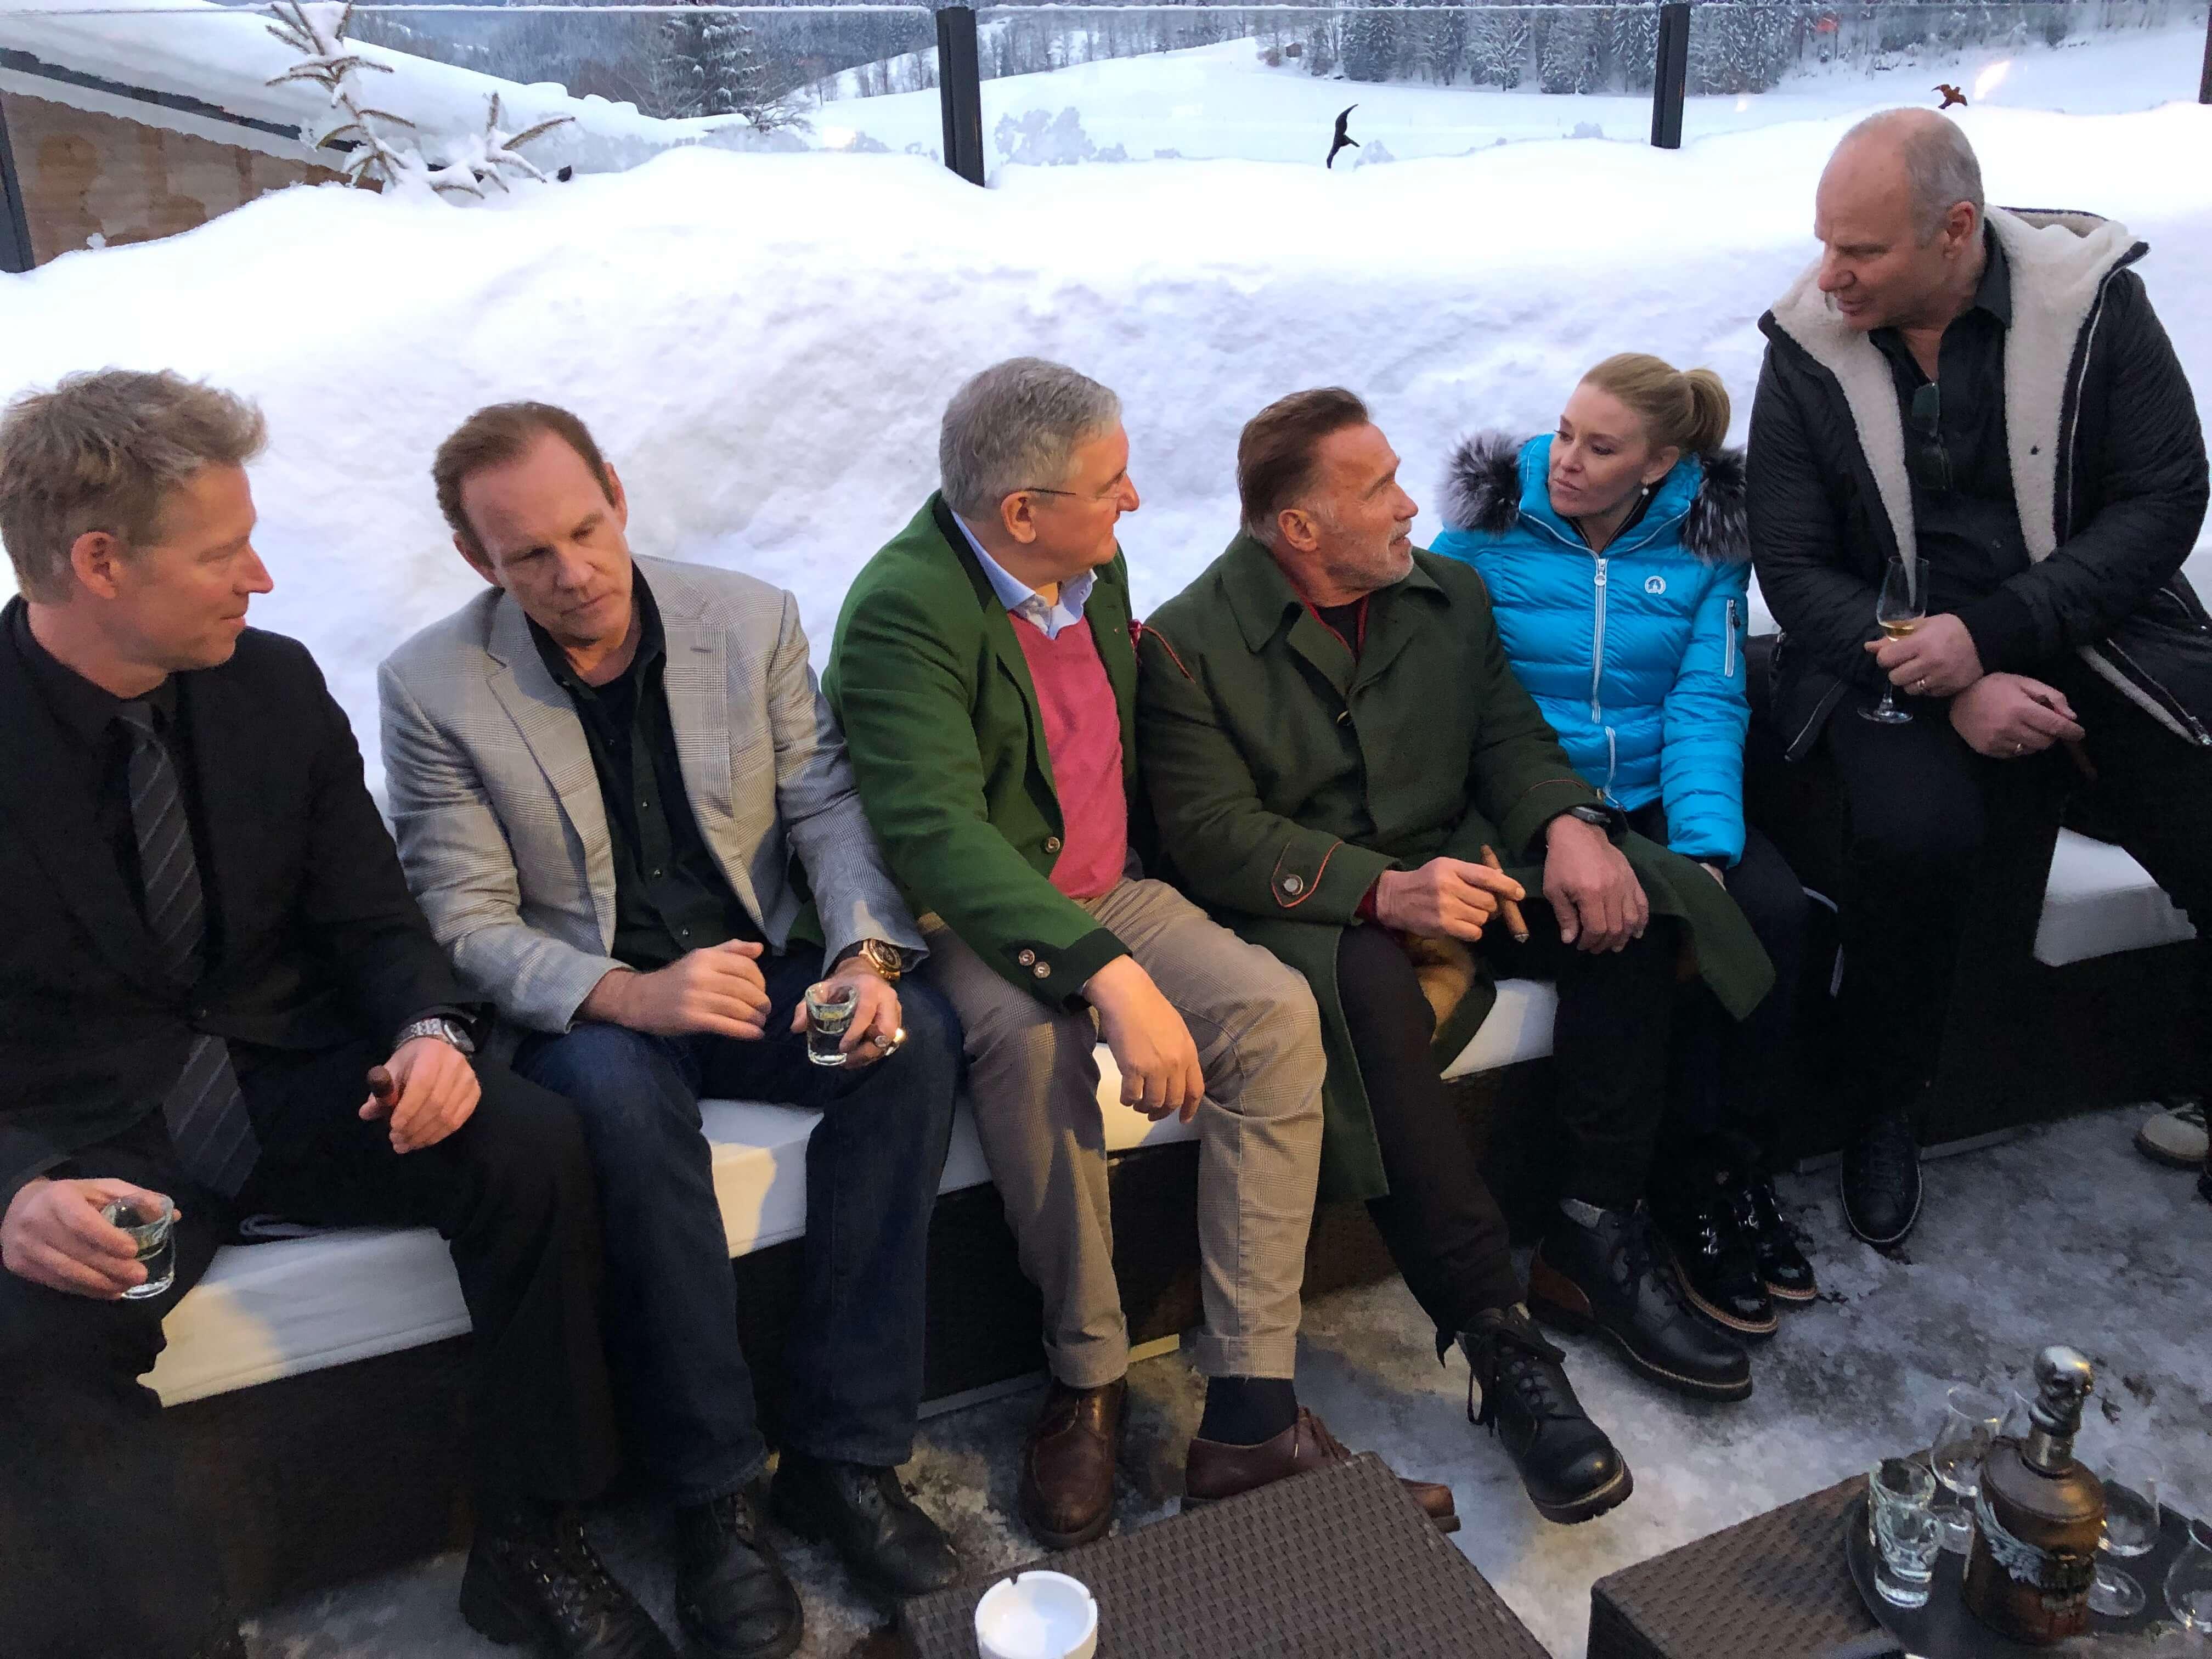 Event_kitz_2019_Arnold_Patrick_Schwarzenegger_Daniel_Marshall_Richard_Hauser_Heather-Milligan_Franz_Webber